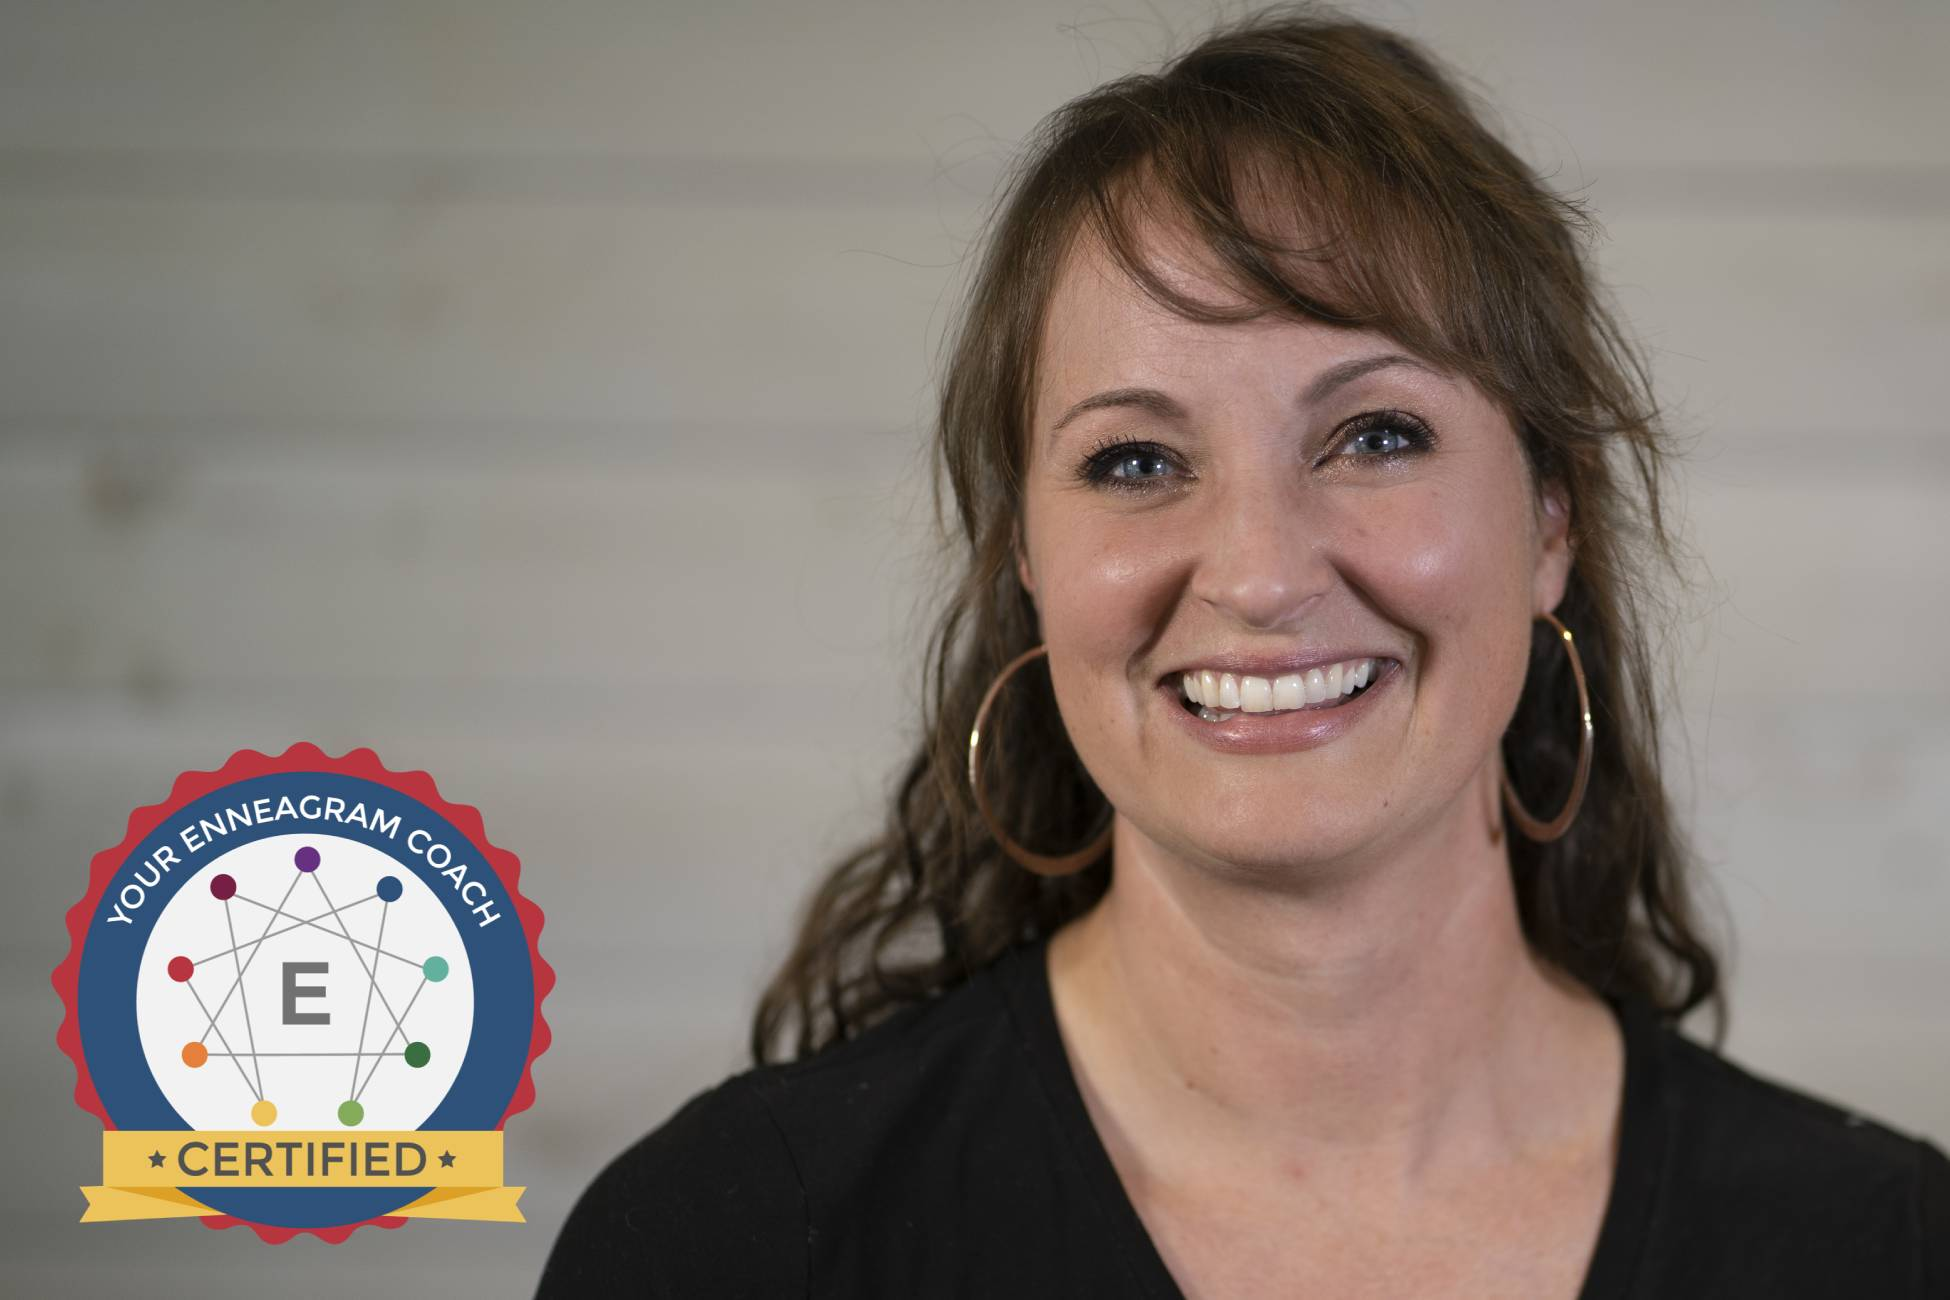 Haley Watkins Enneagram Coach Headshot